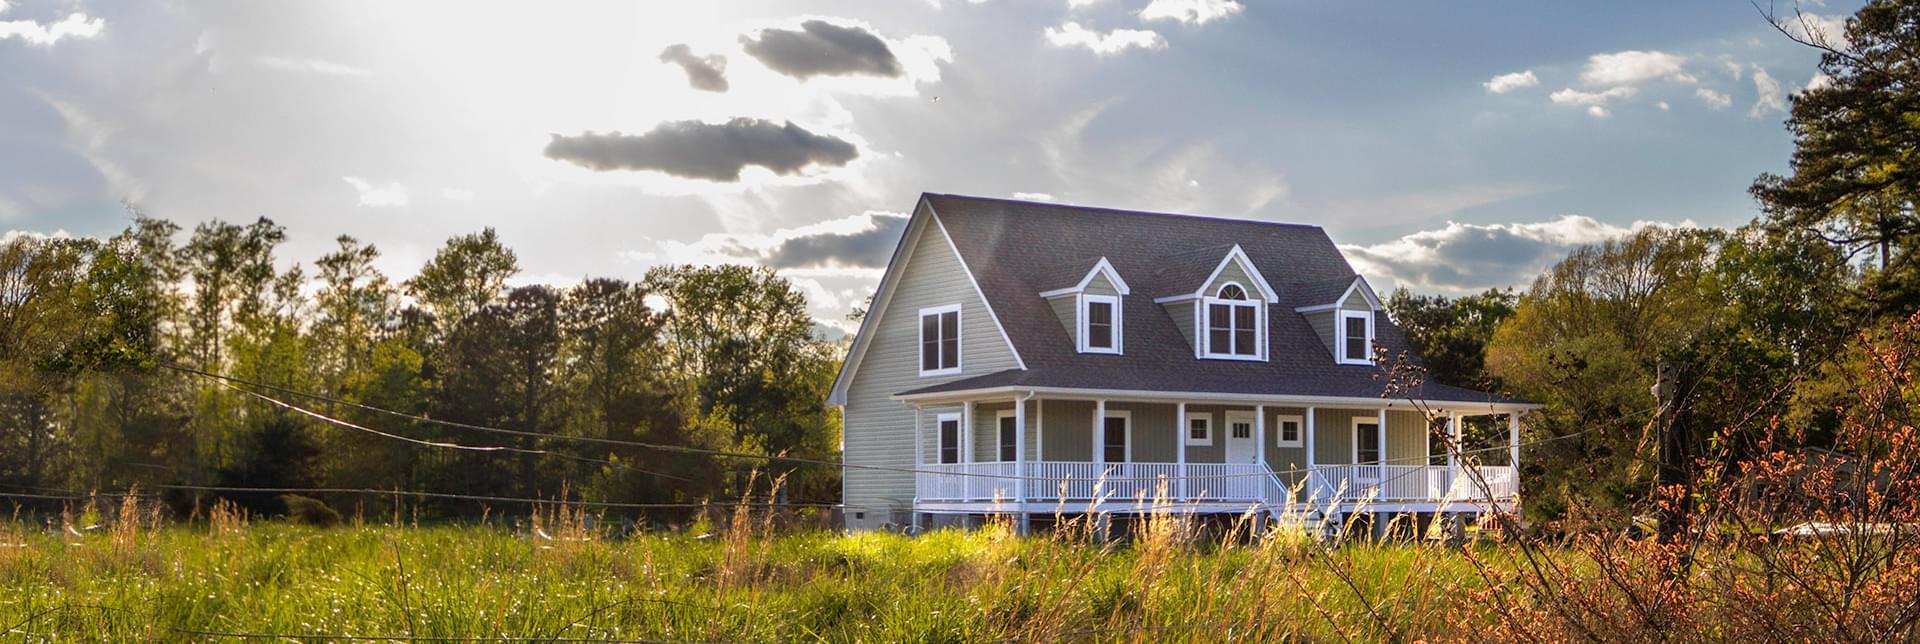 New Homes in Brunswick County VA